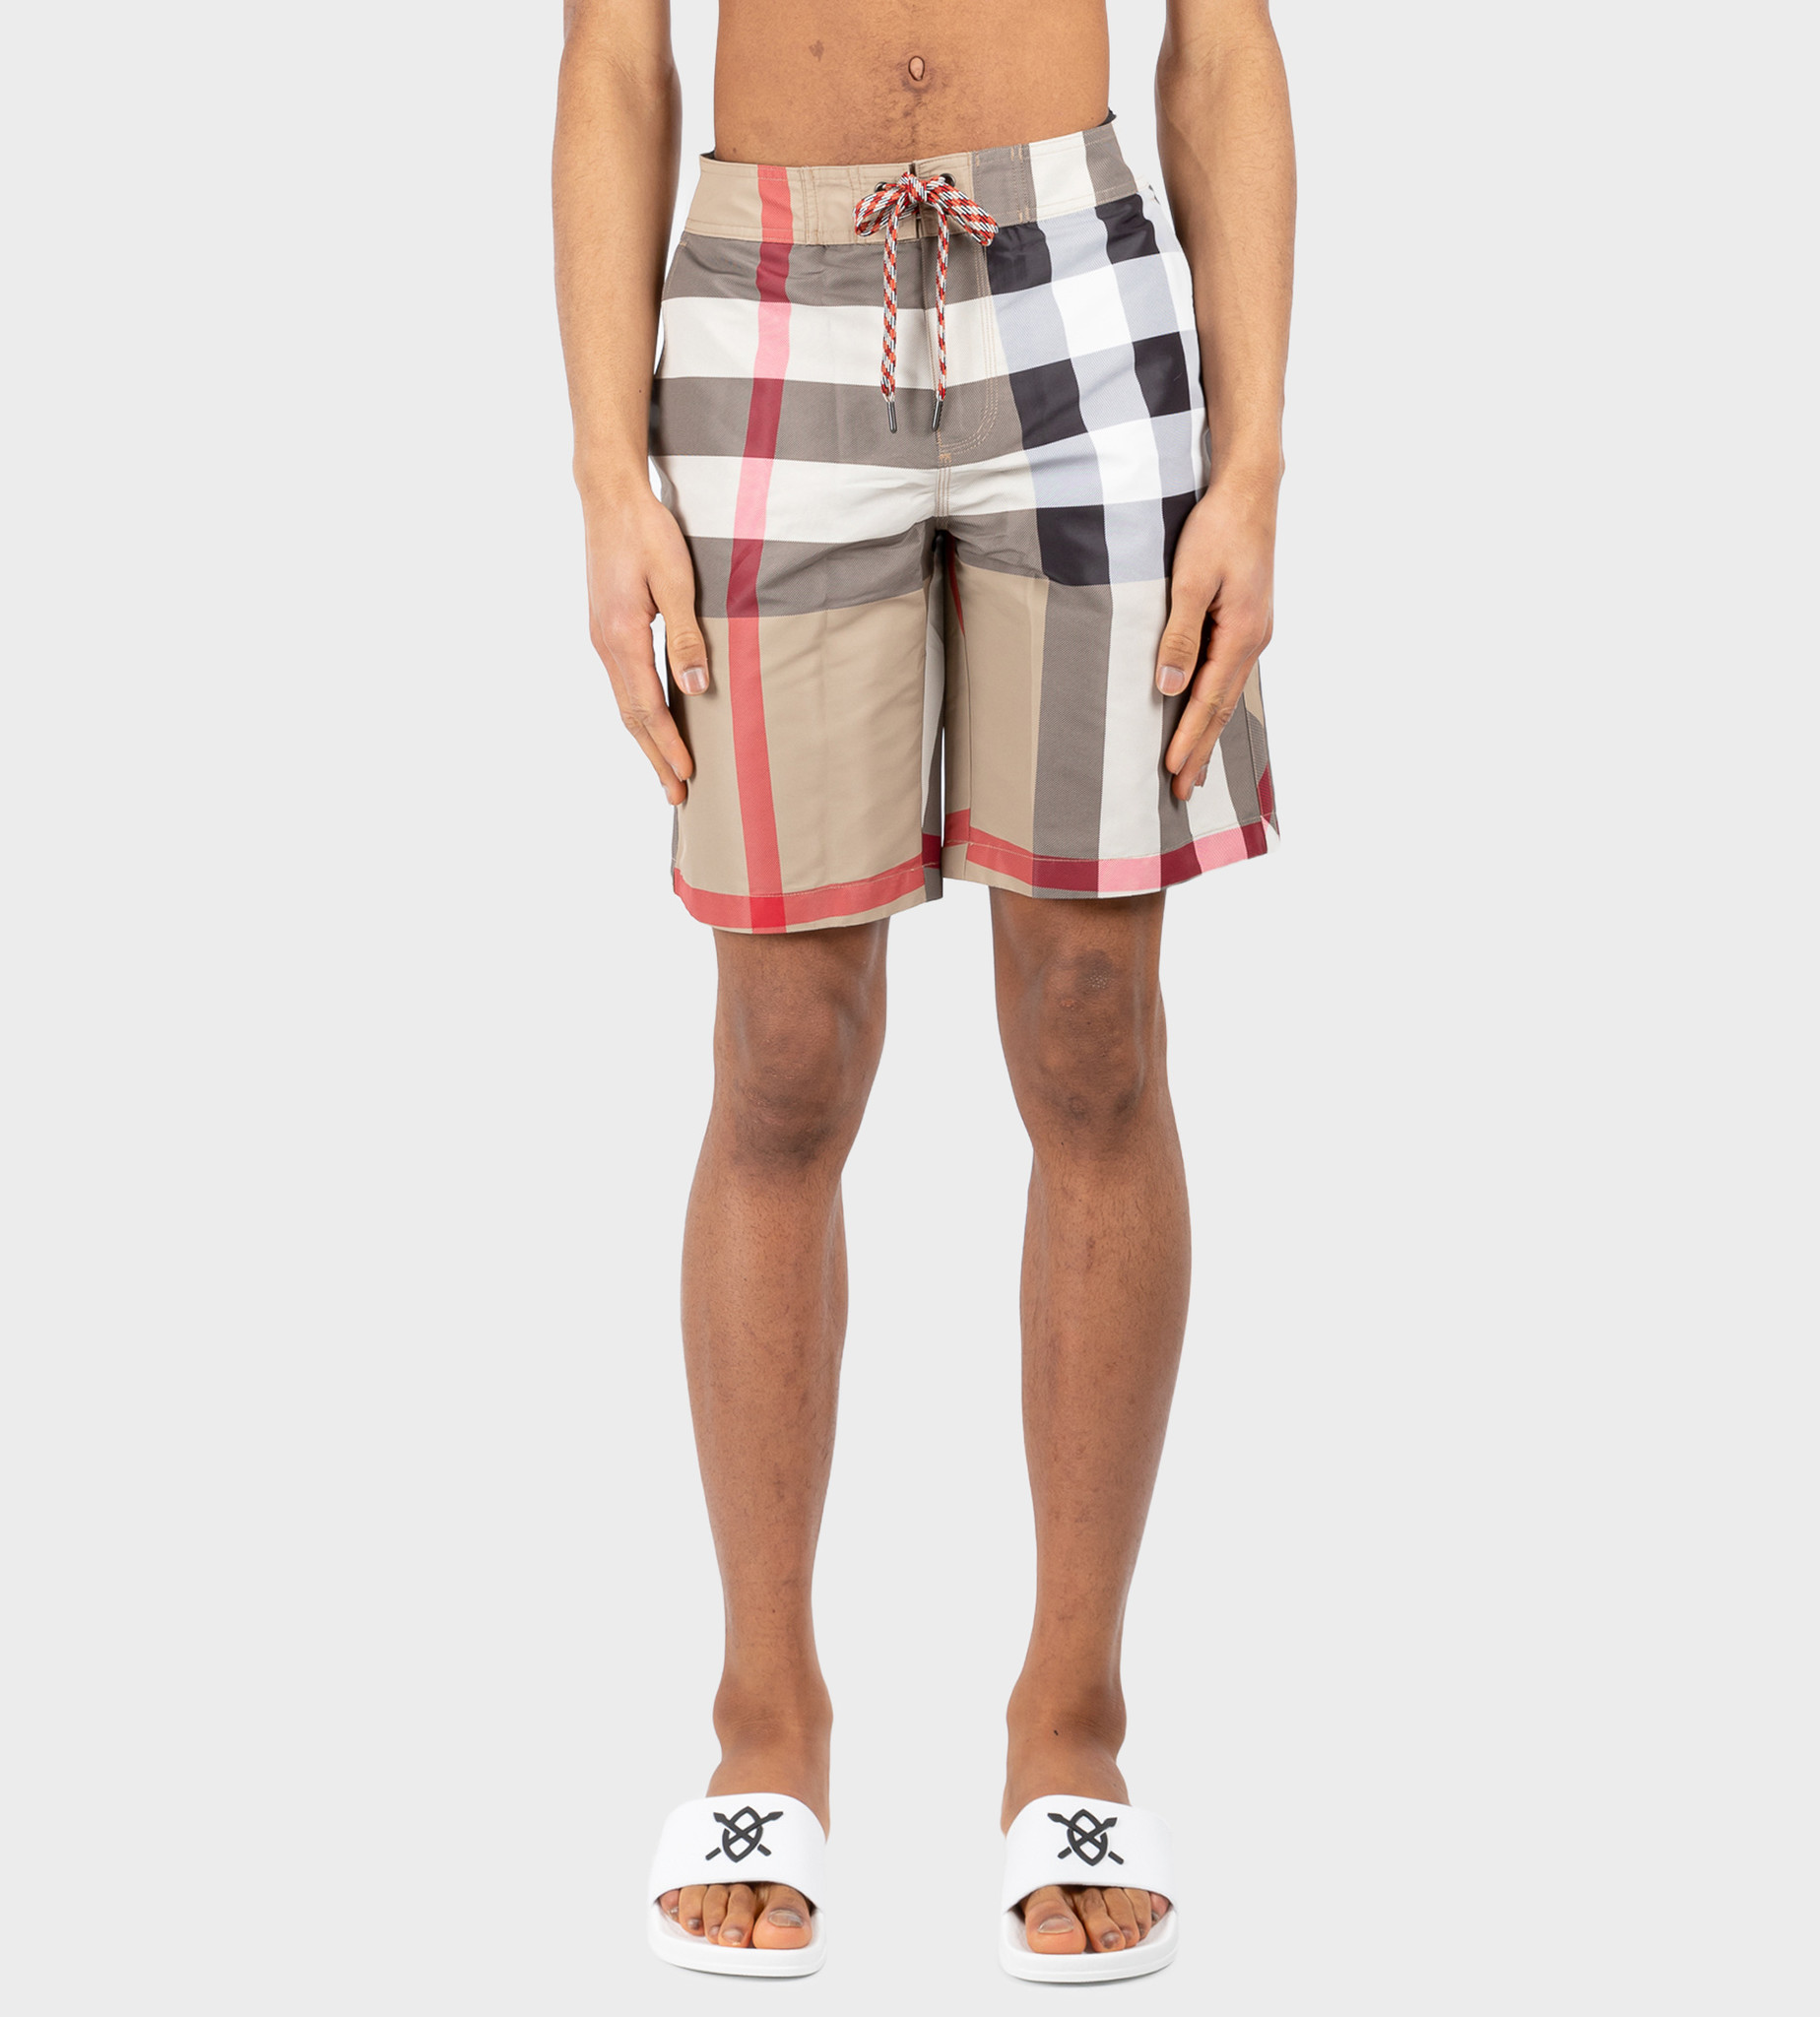 BURBERRY Check Swim Shorts Beige